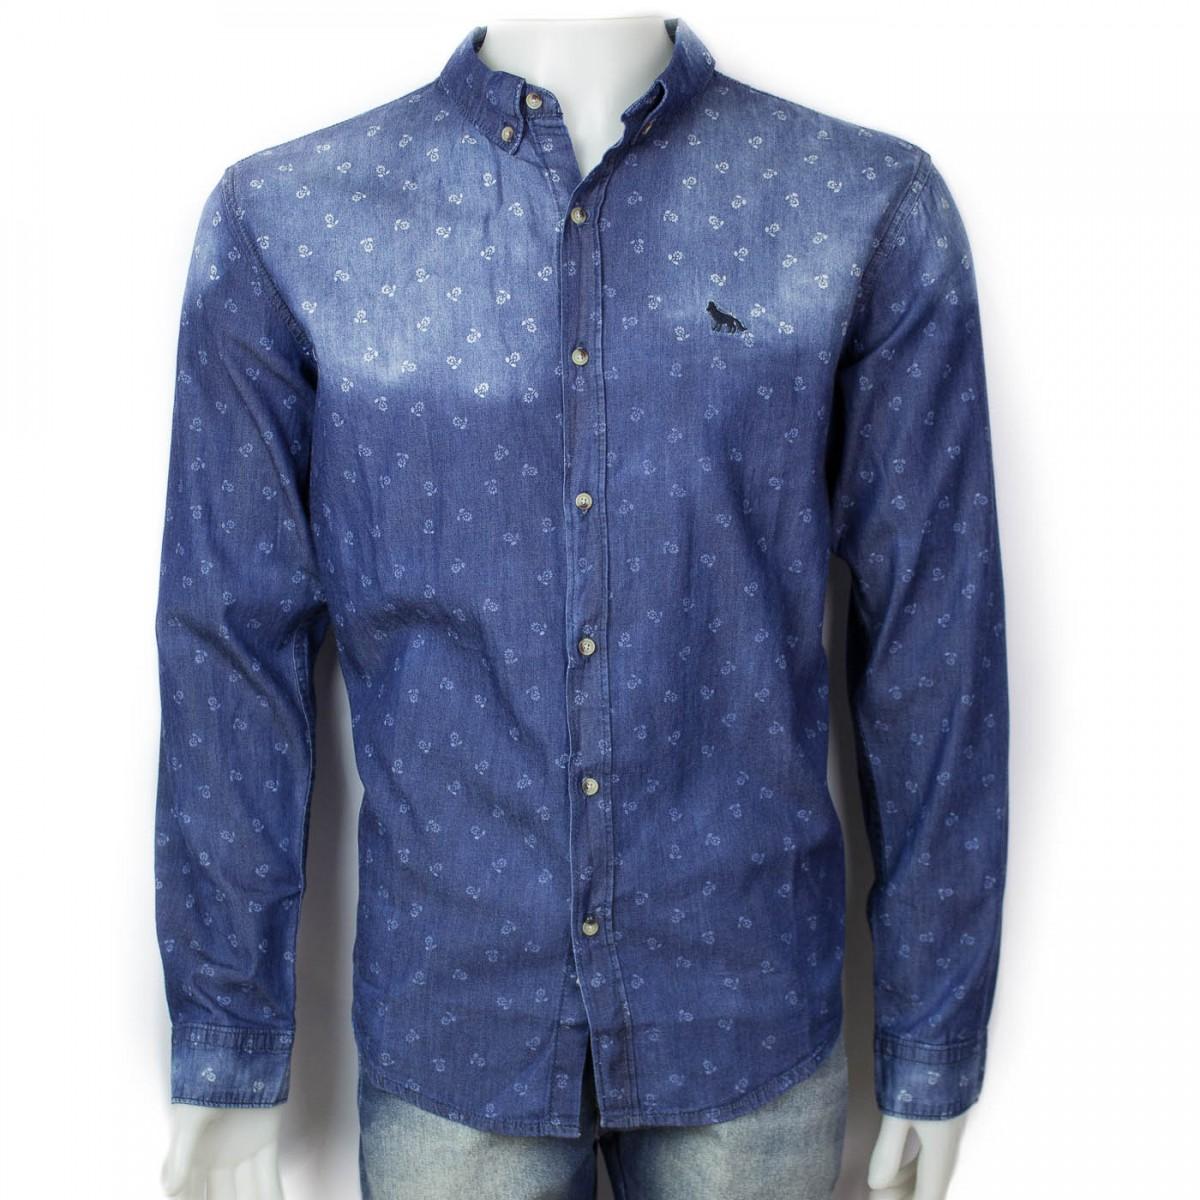 2c3a8f40278cc Bizz Store - Camisa Masculina Acostamento Jeans Azul Com Estampa